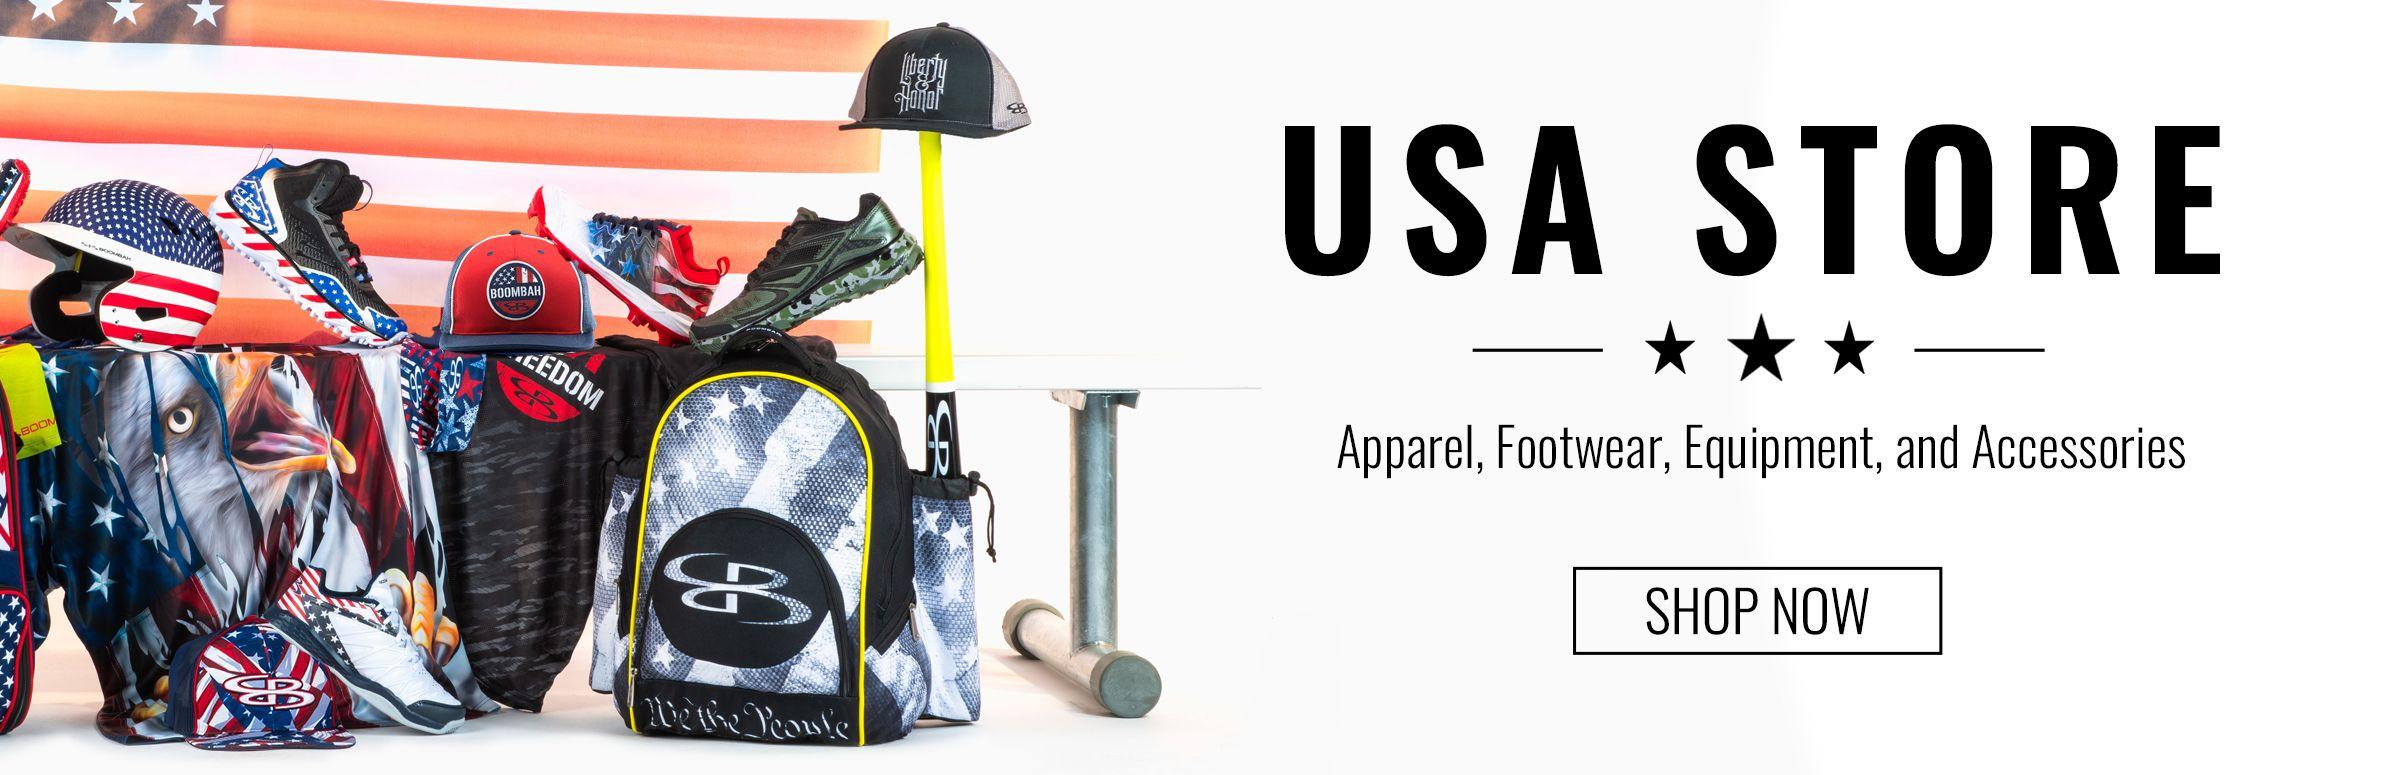 Boombah - Custom Uniforms, Footwear and Athletic Equipment